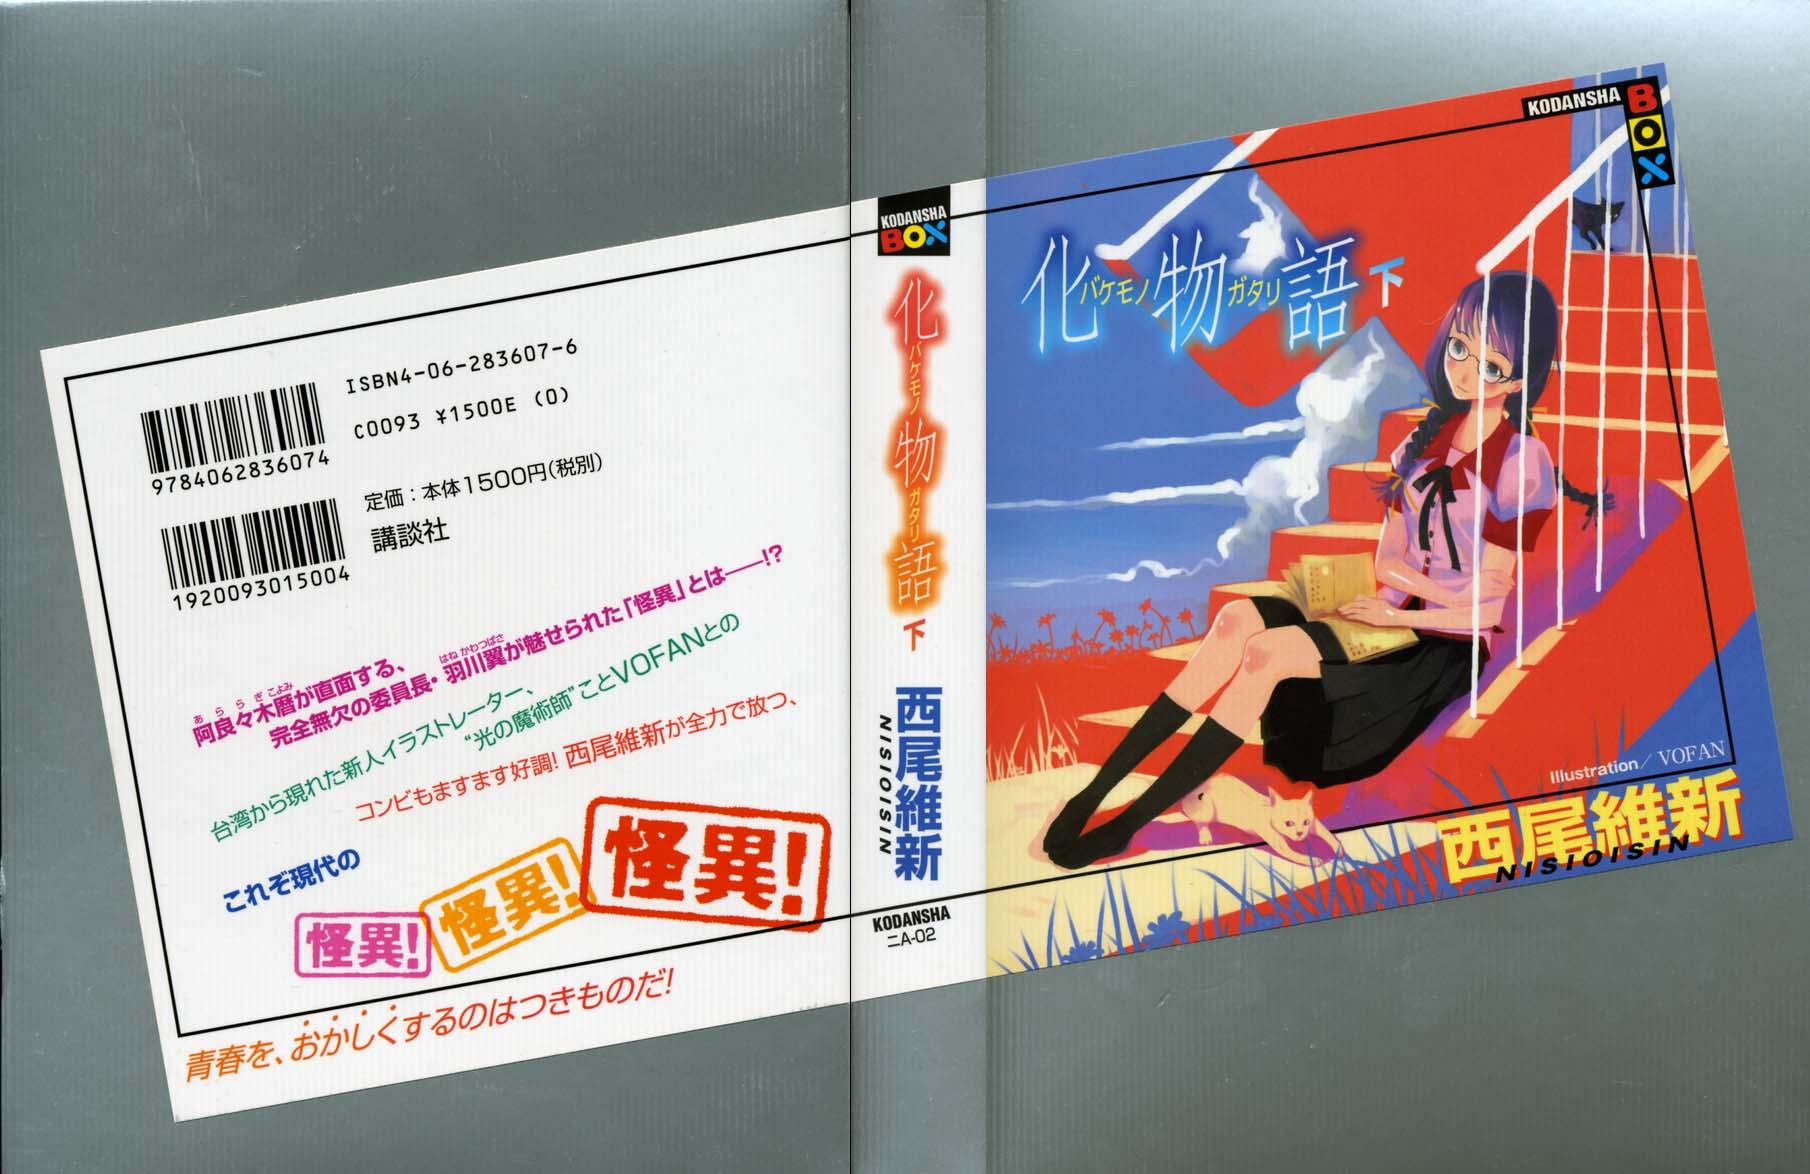 Bakemonogatari - Vol 2 Minh họa